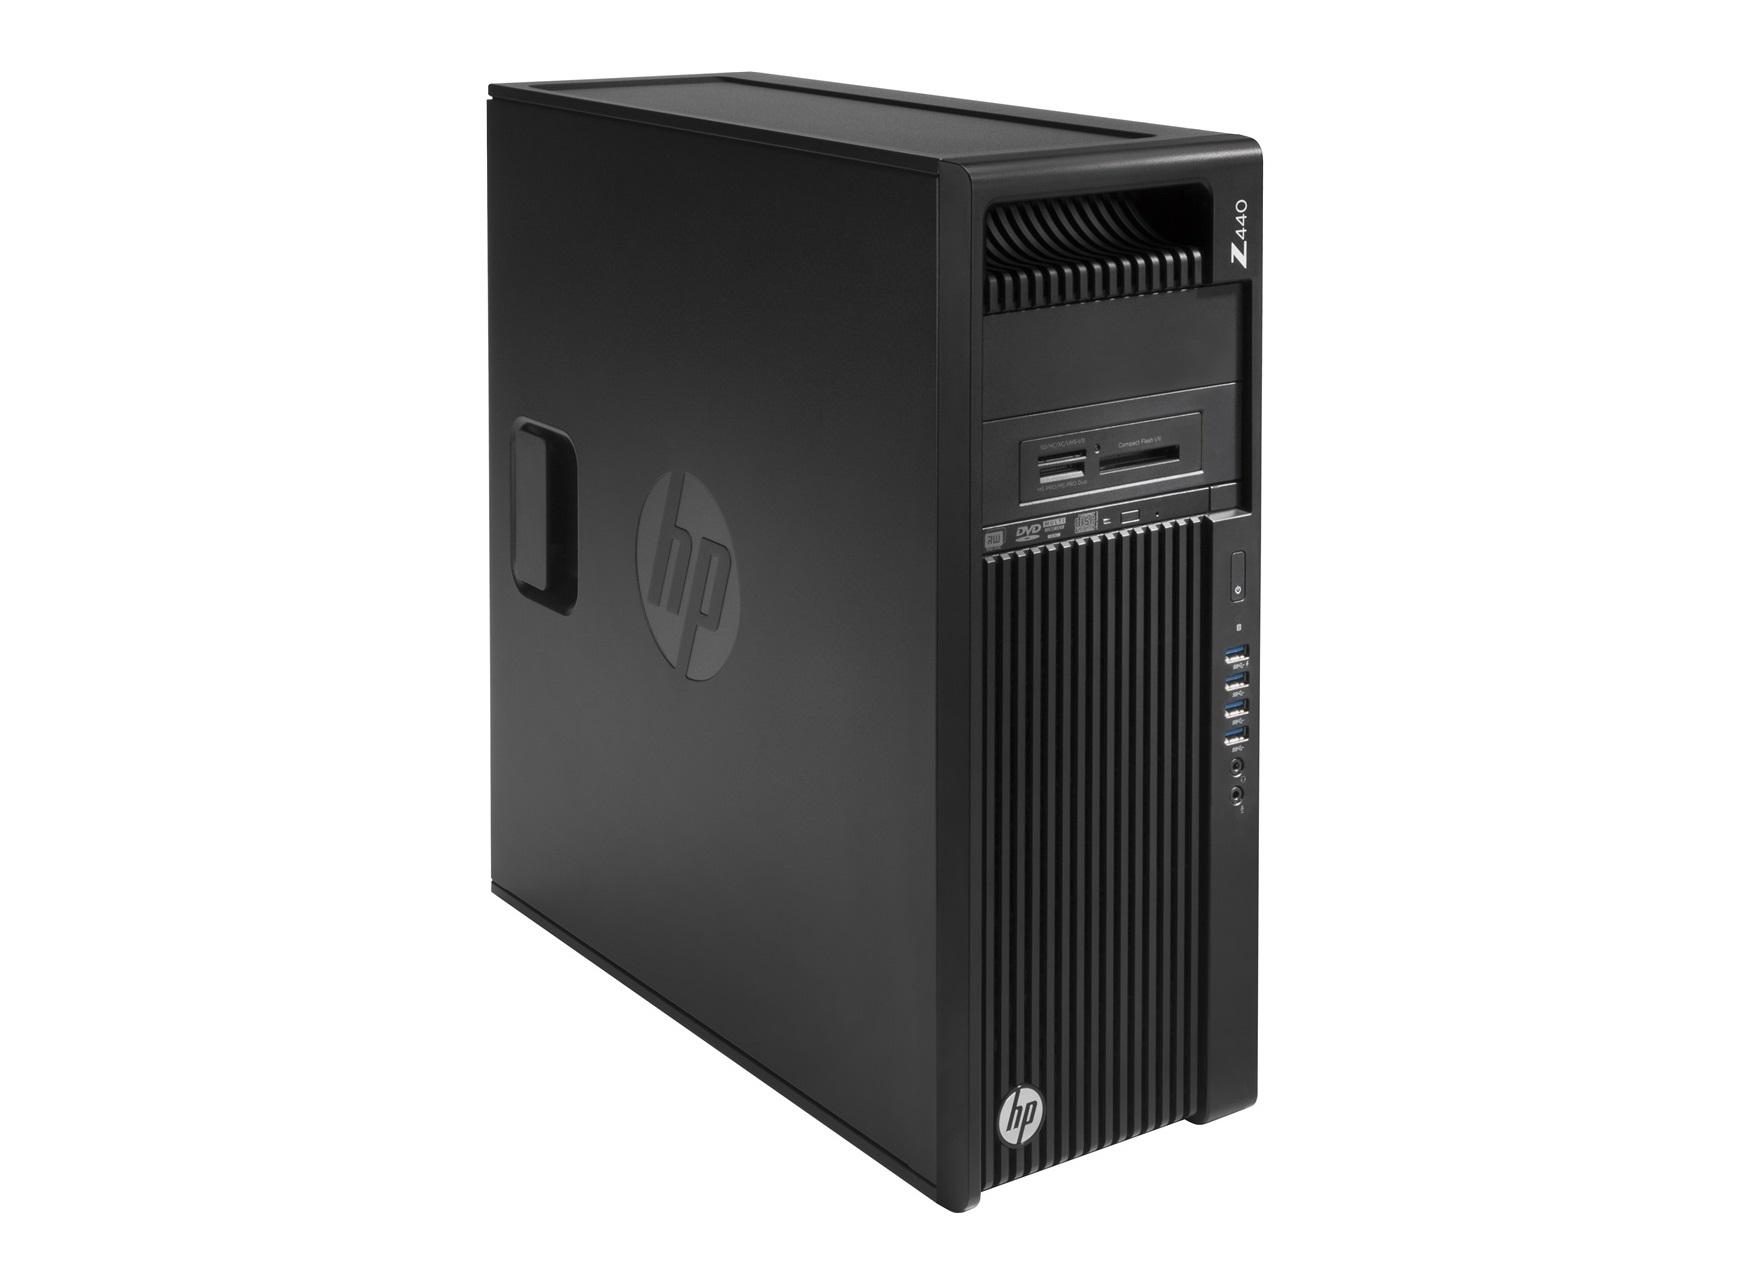 HP Z440 Xeon E5-1650v4 6c, 512B G2 Pcie, 2x8GB DDR4 ECC,DVDRW,no VGA,no keyb, mouse, MCR, Win10Pro